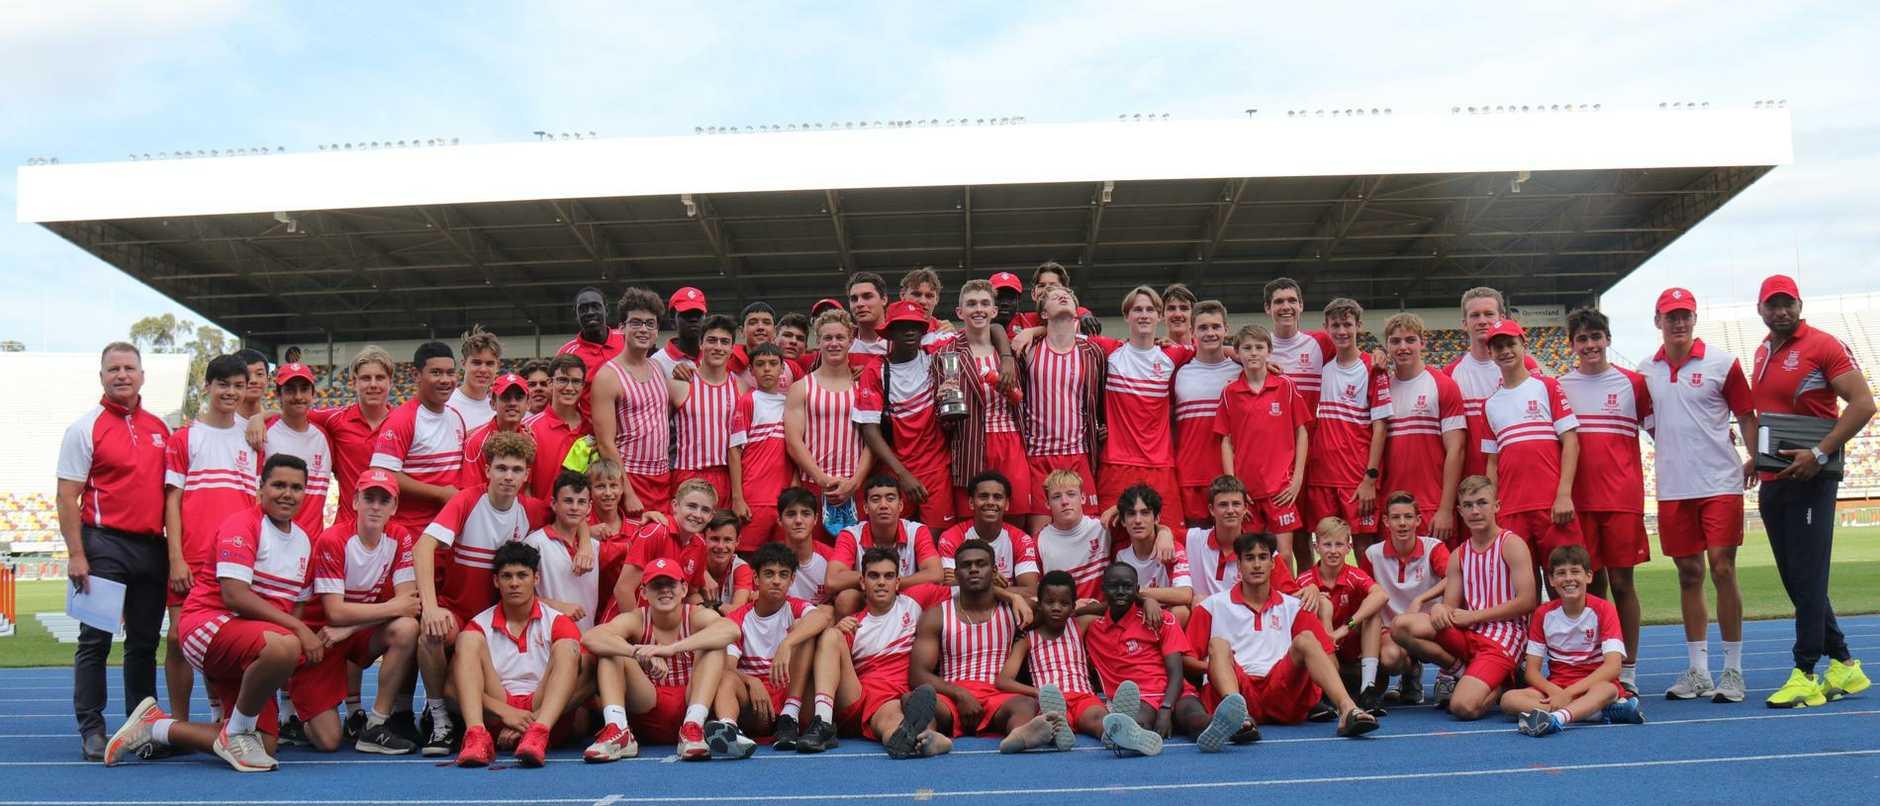 The successful Ipswich Grammar School track and field team.